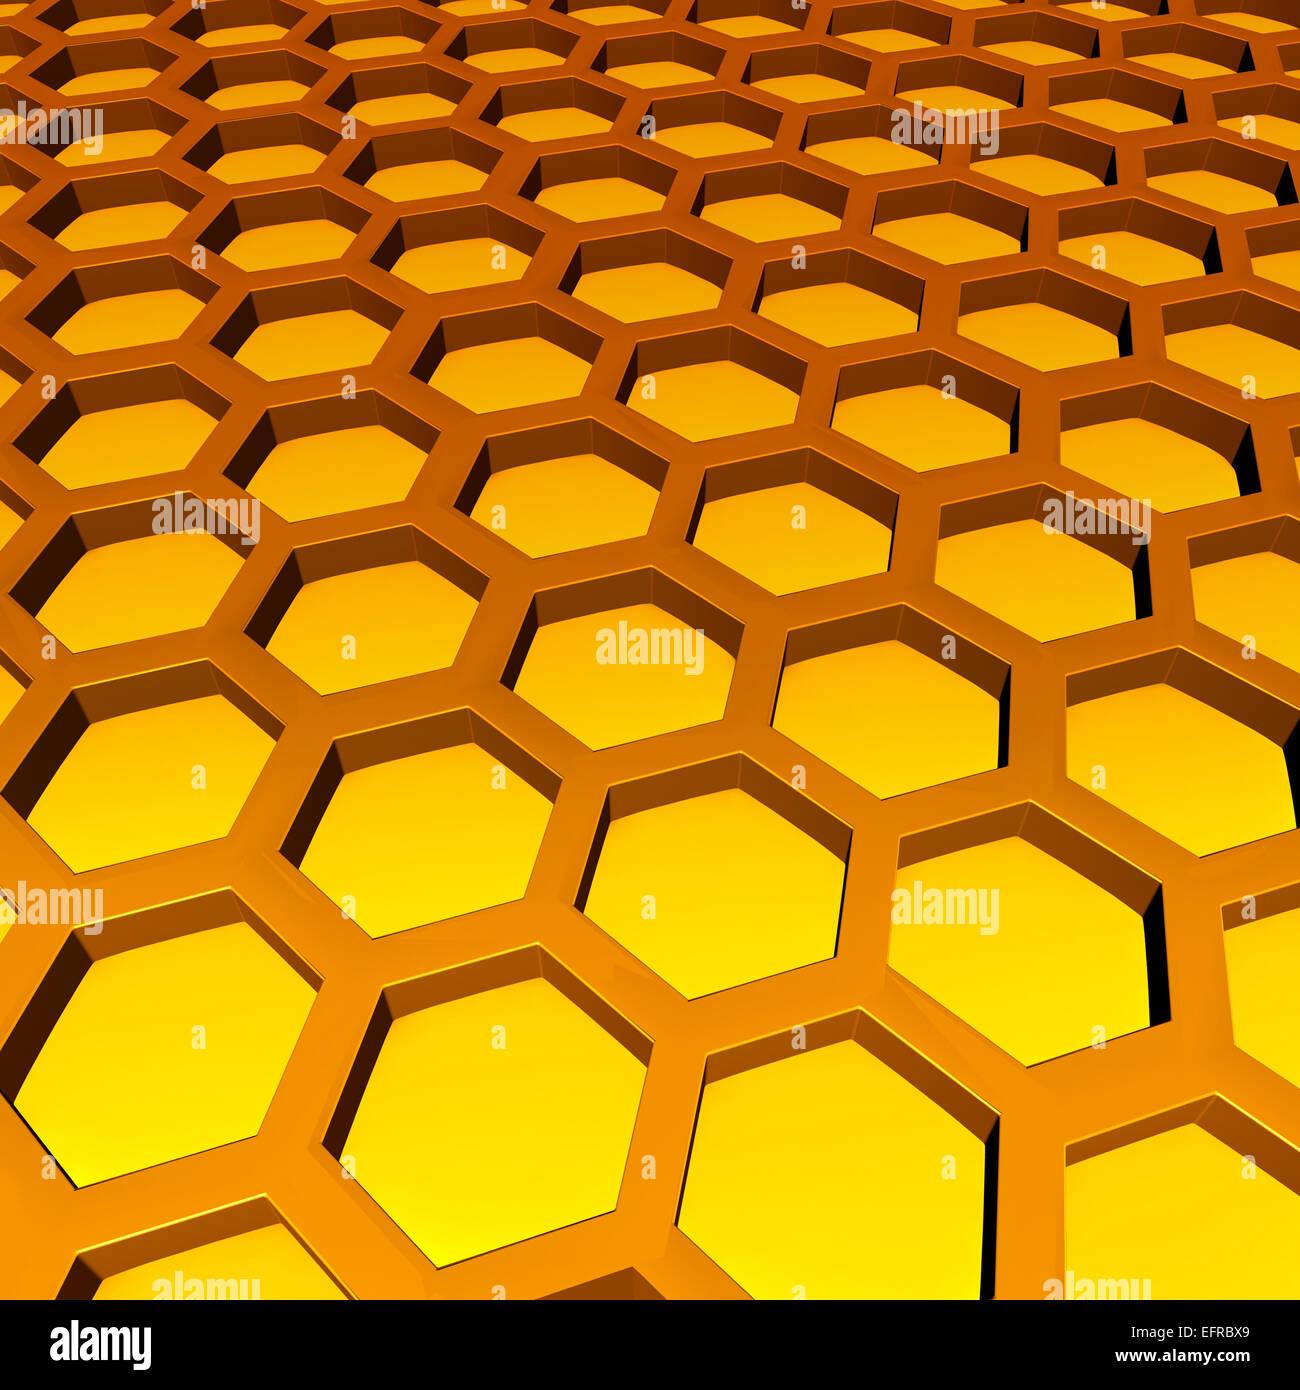 Waben Sie-Muster als drei dimensionale Sechseck Zelle Geometrien mit ...